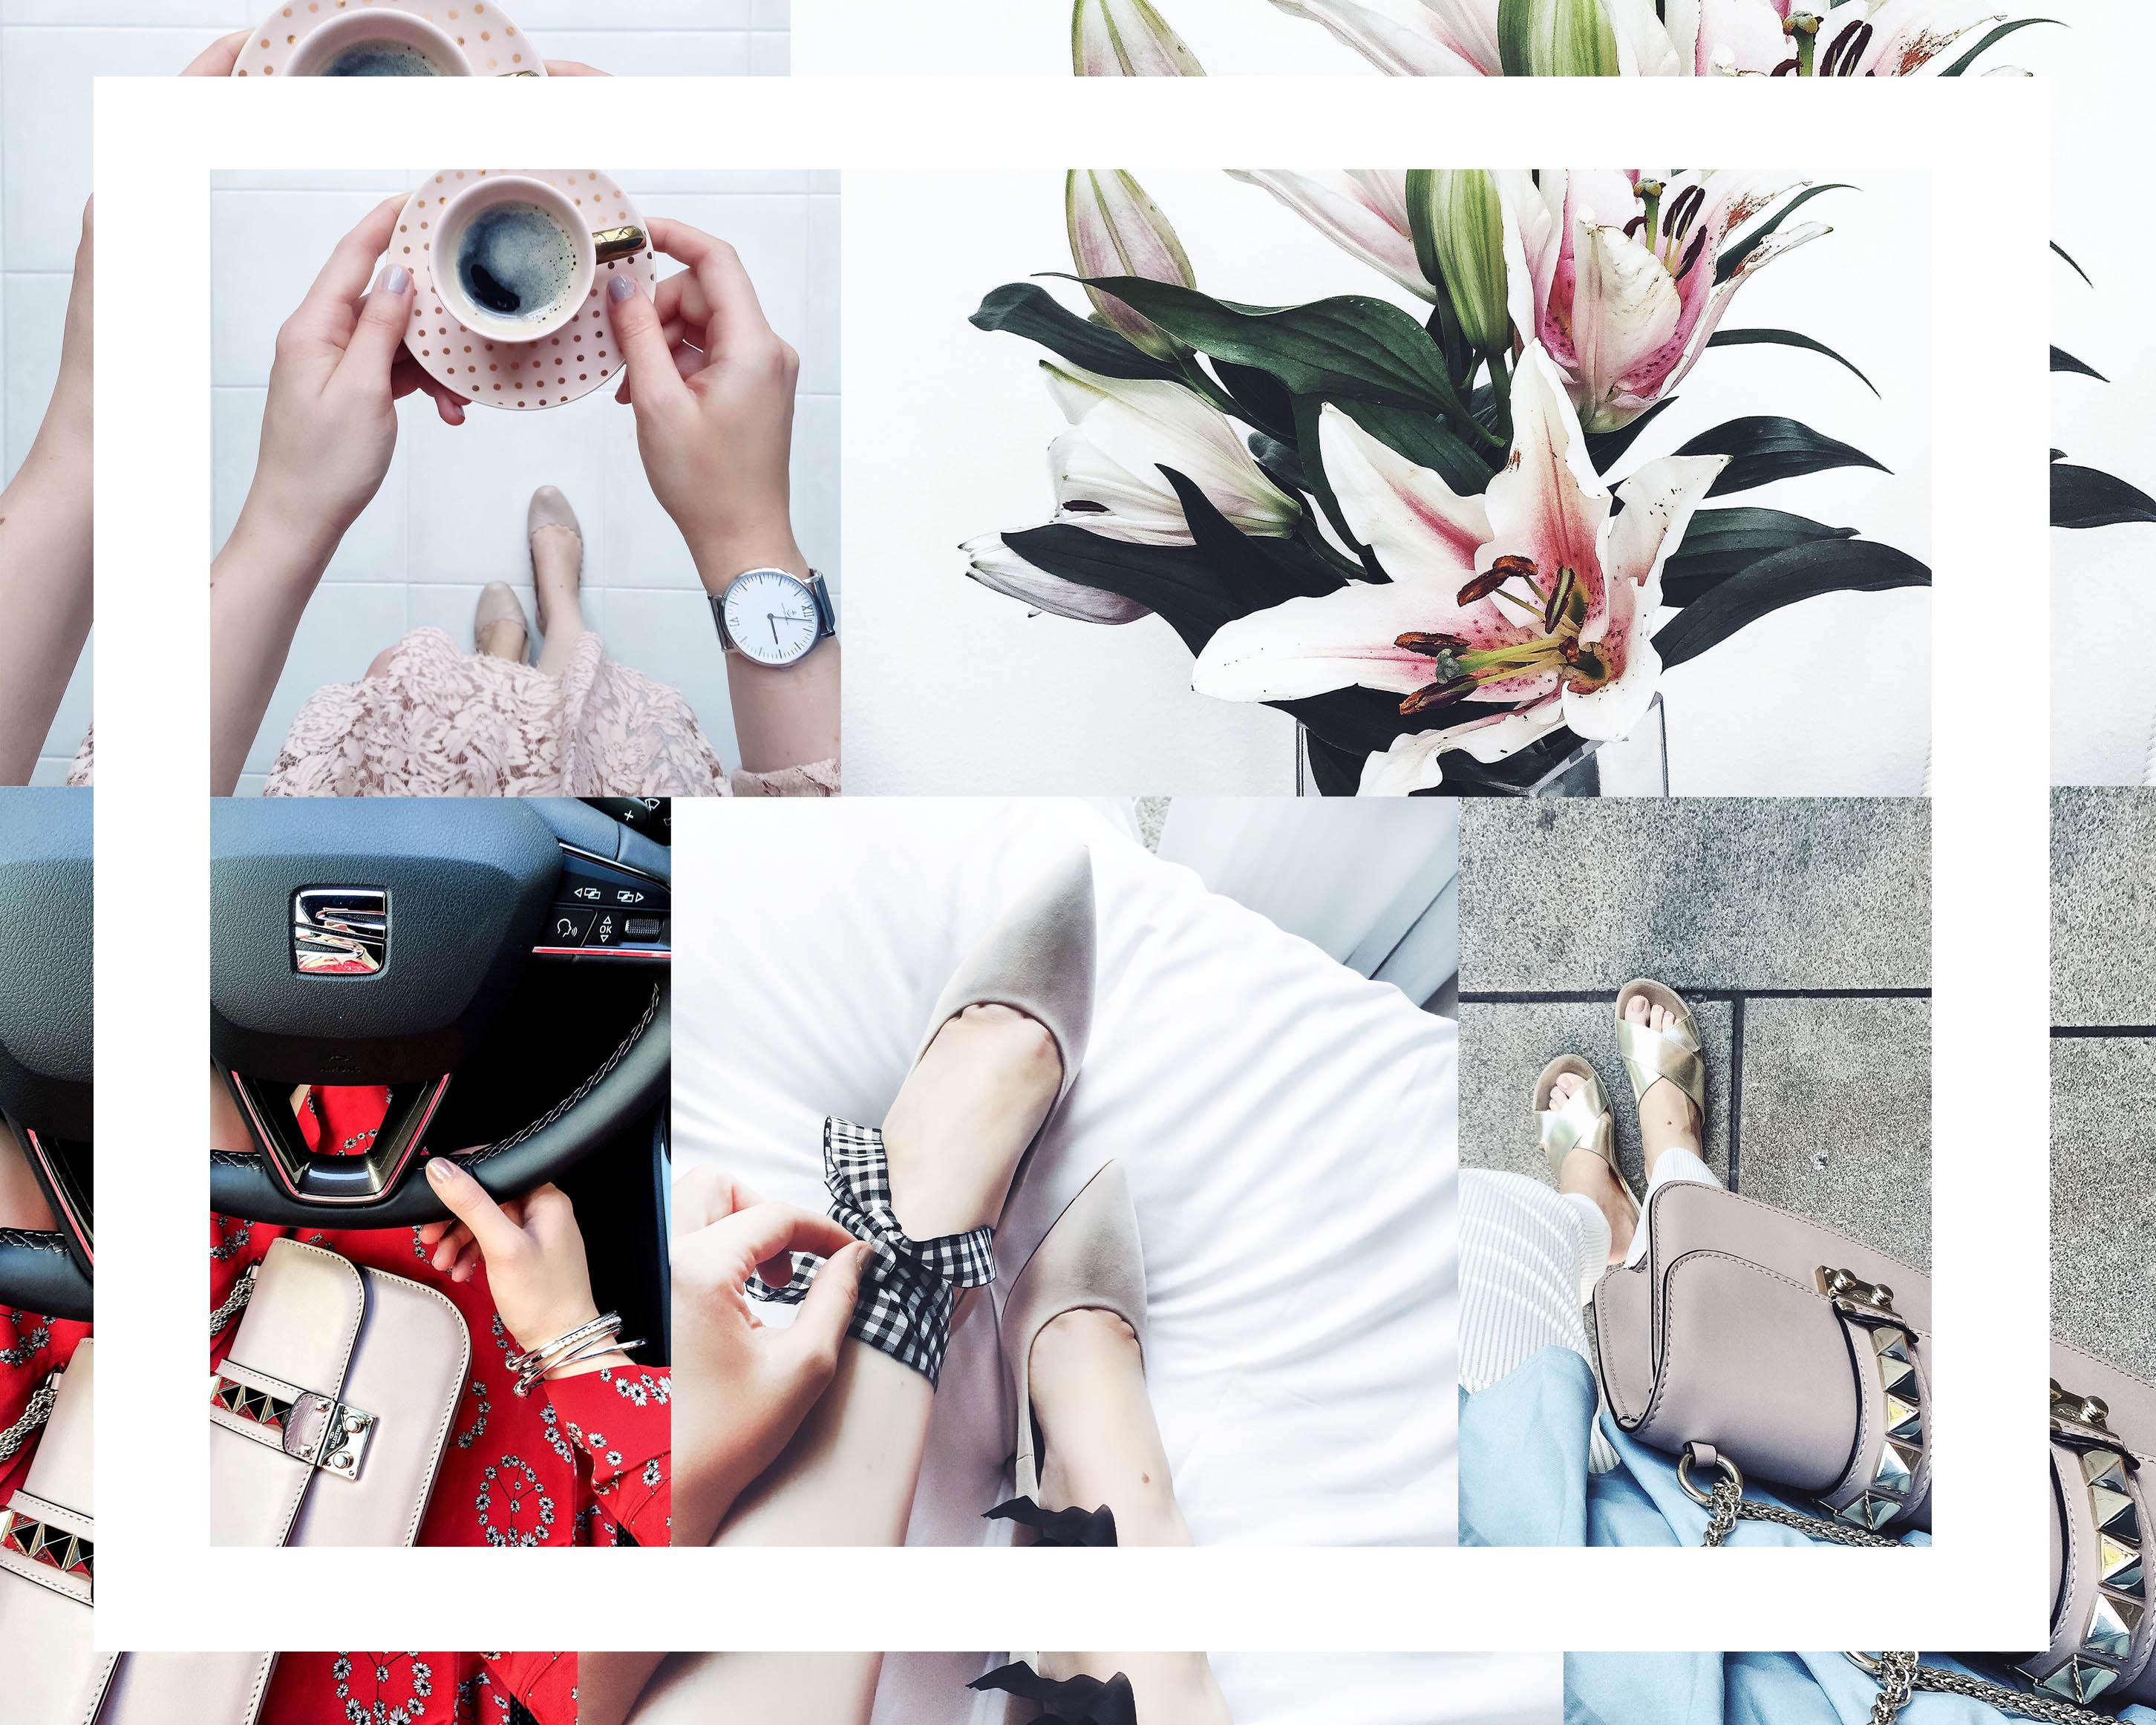 Instagram_tipps_follower_bearbeiten_apps_zukkerme_3